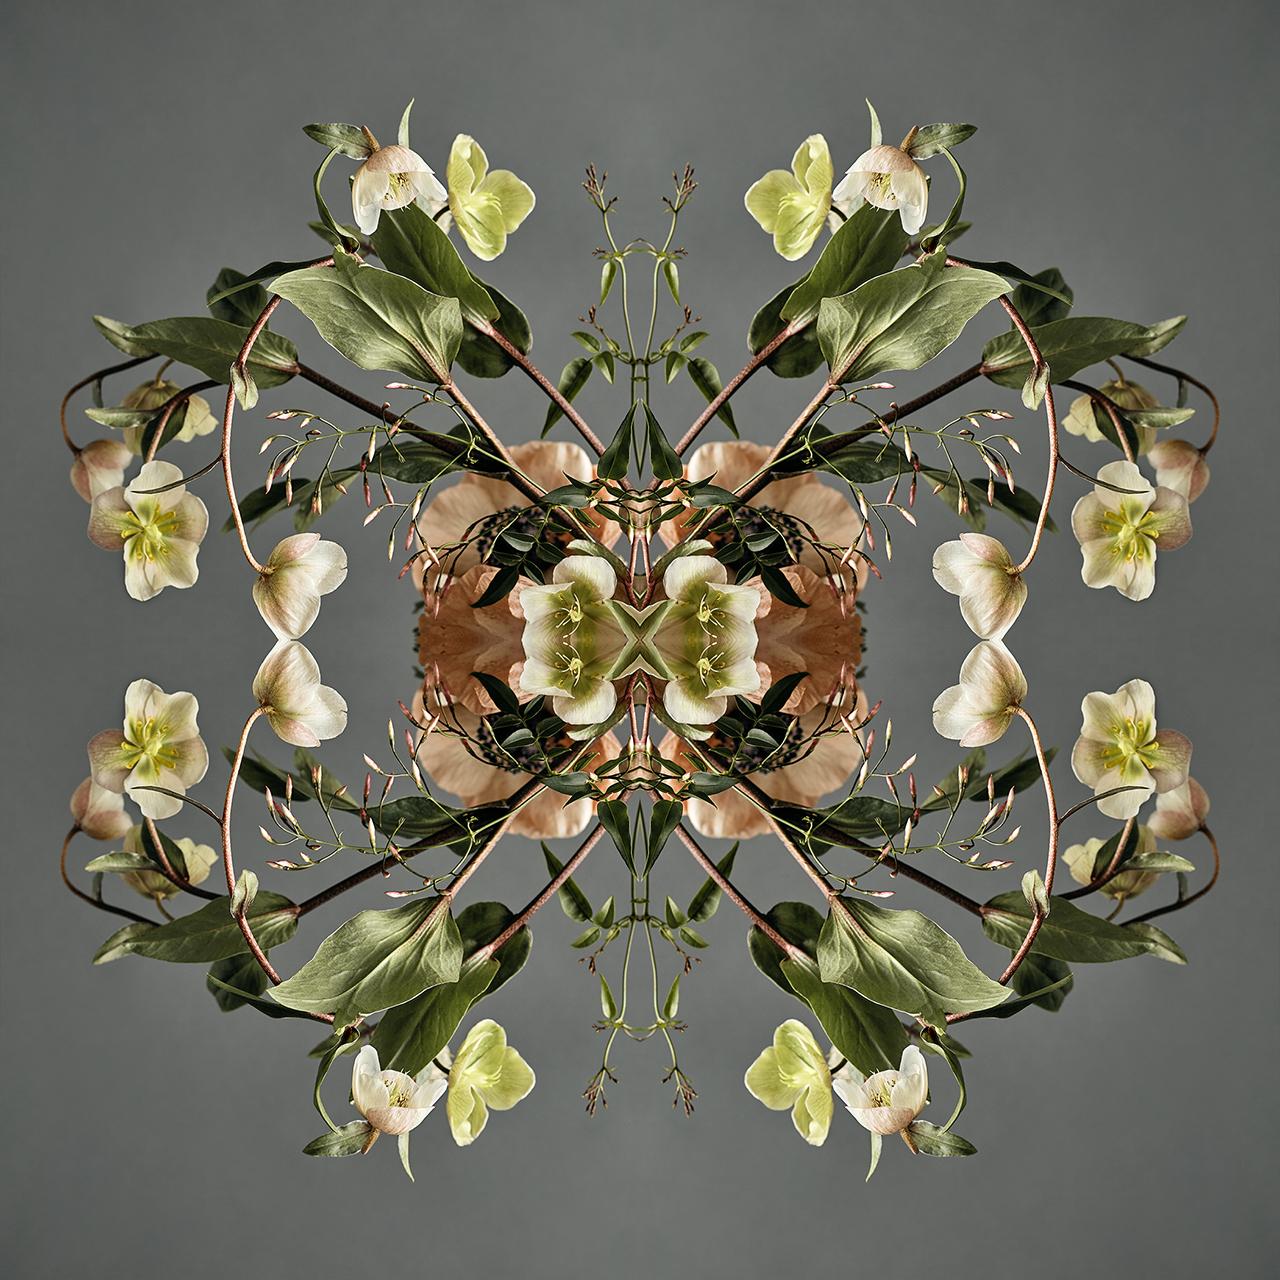 erin derby botanical photographer